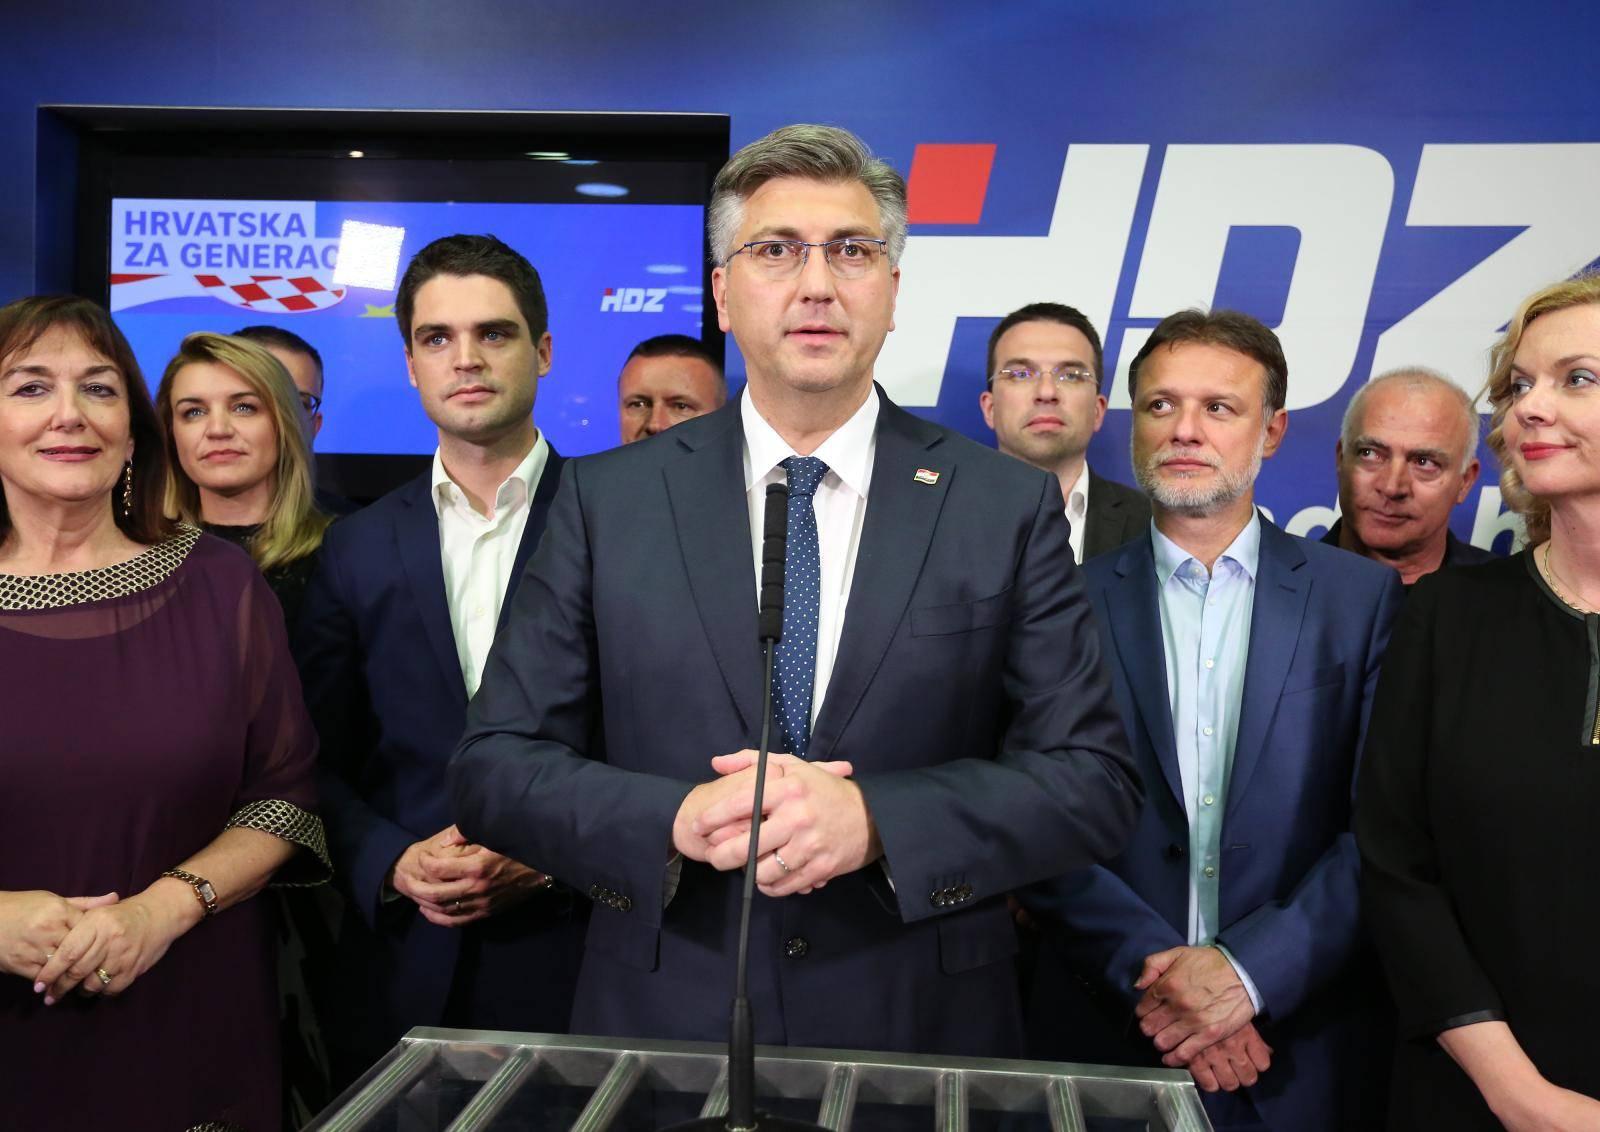 Zagreb: Andrej Plenković obratio se medijima nakon objave službenih rezultata EU izbora